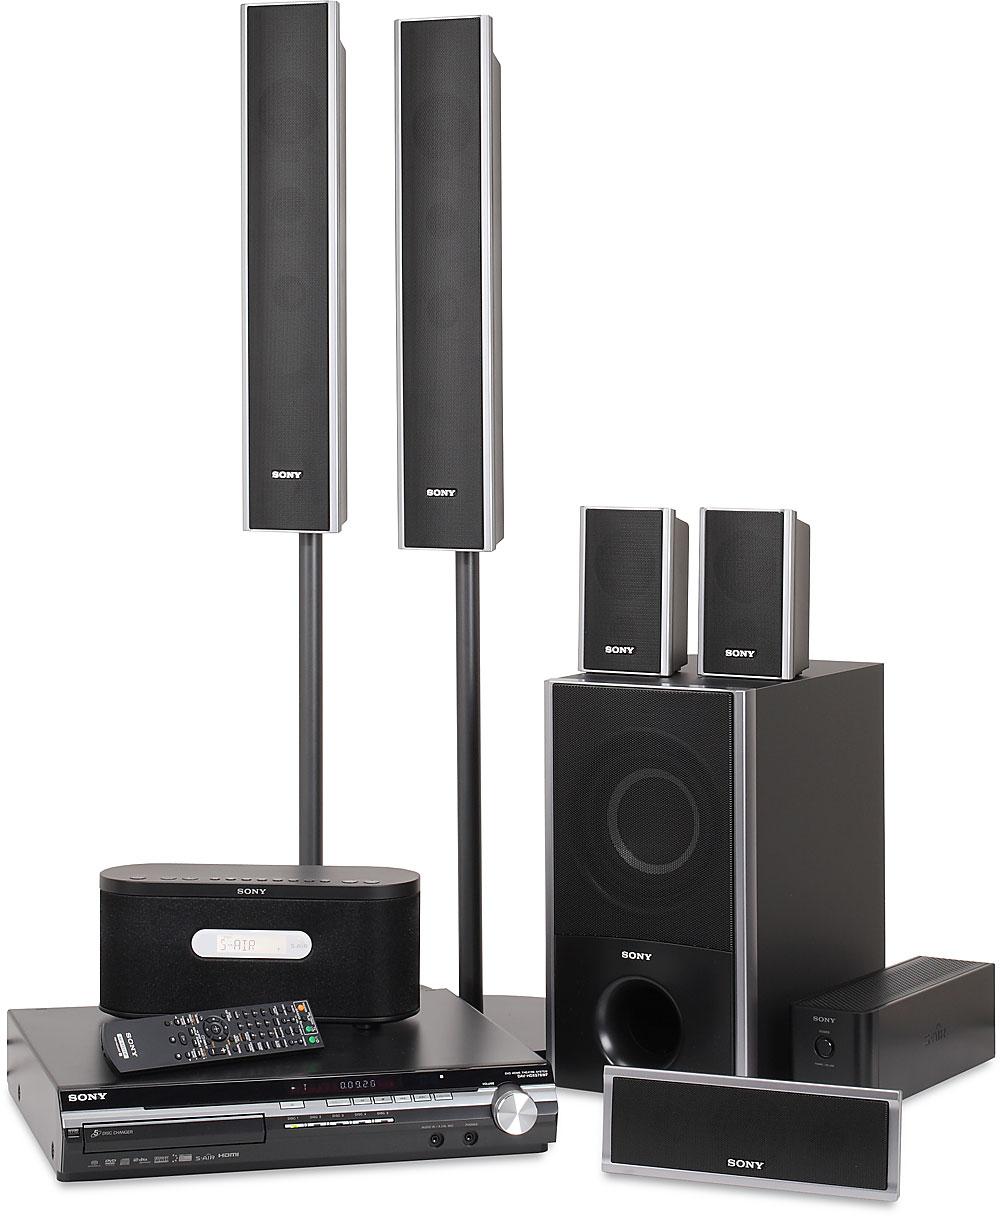 Sony DAV-HDX576WF 5-disc BRAVIA® DVD home theater system ...